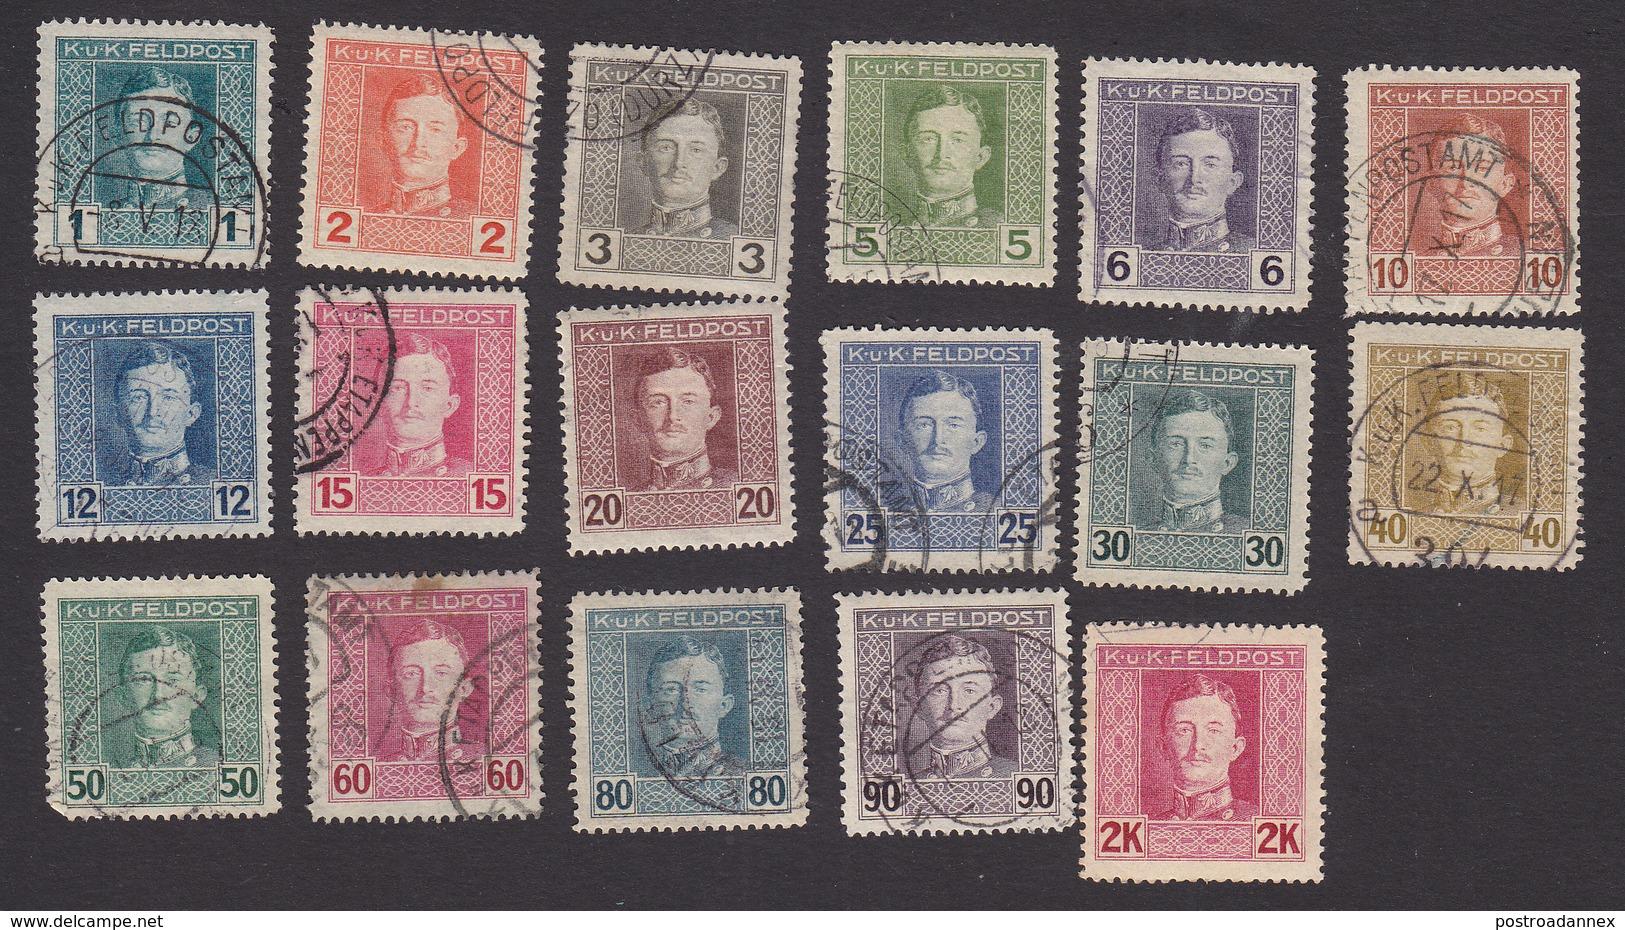 Austria, Scott #M49-M65, Used, Emperor Karl I Military Stamps, Issued 1917 - Austria